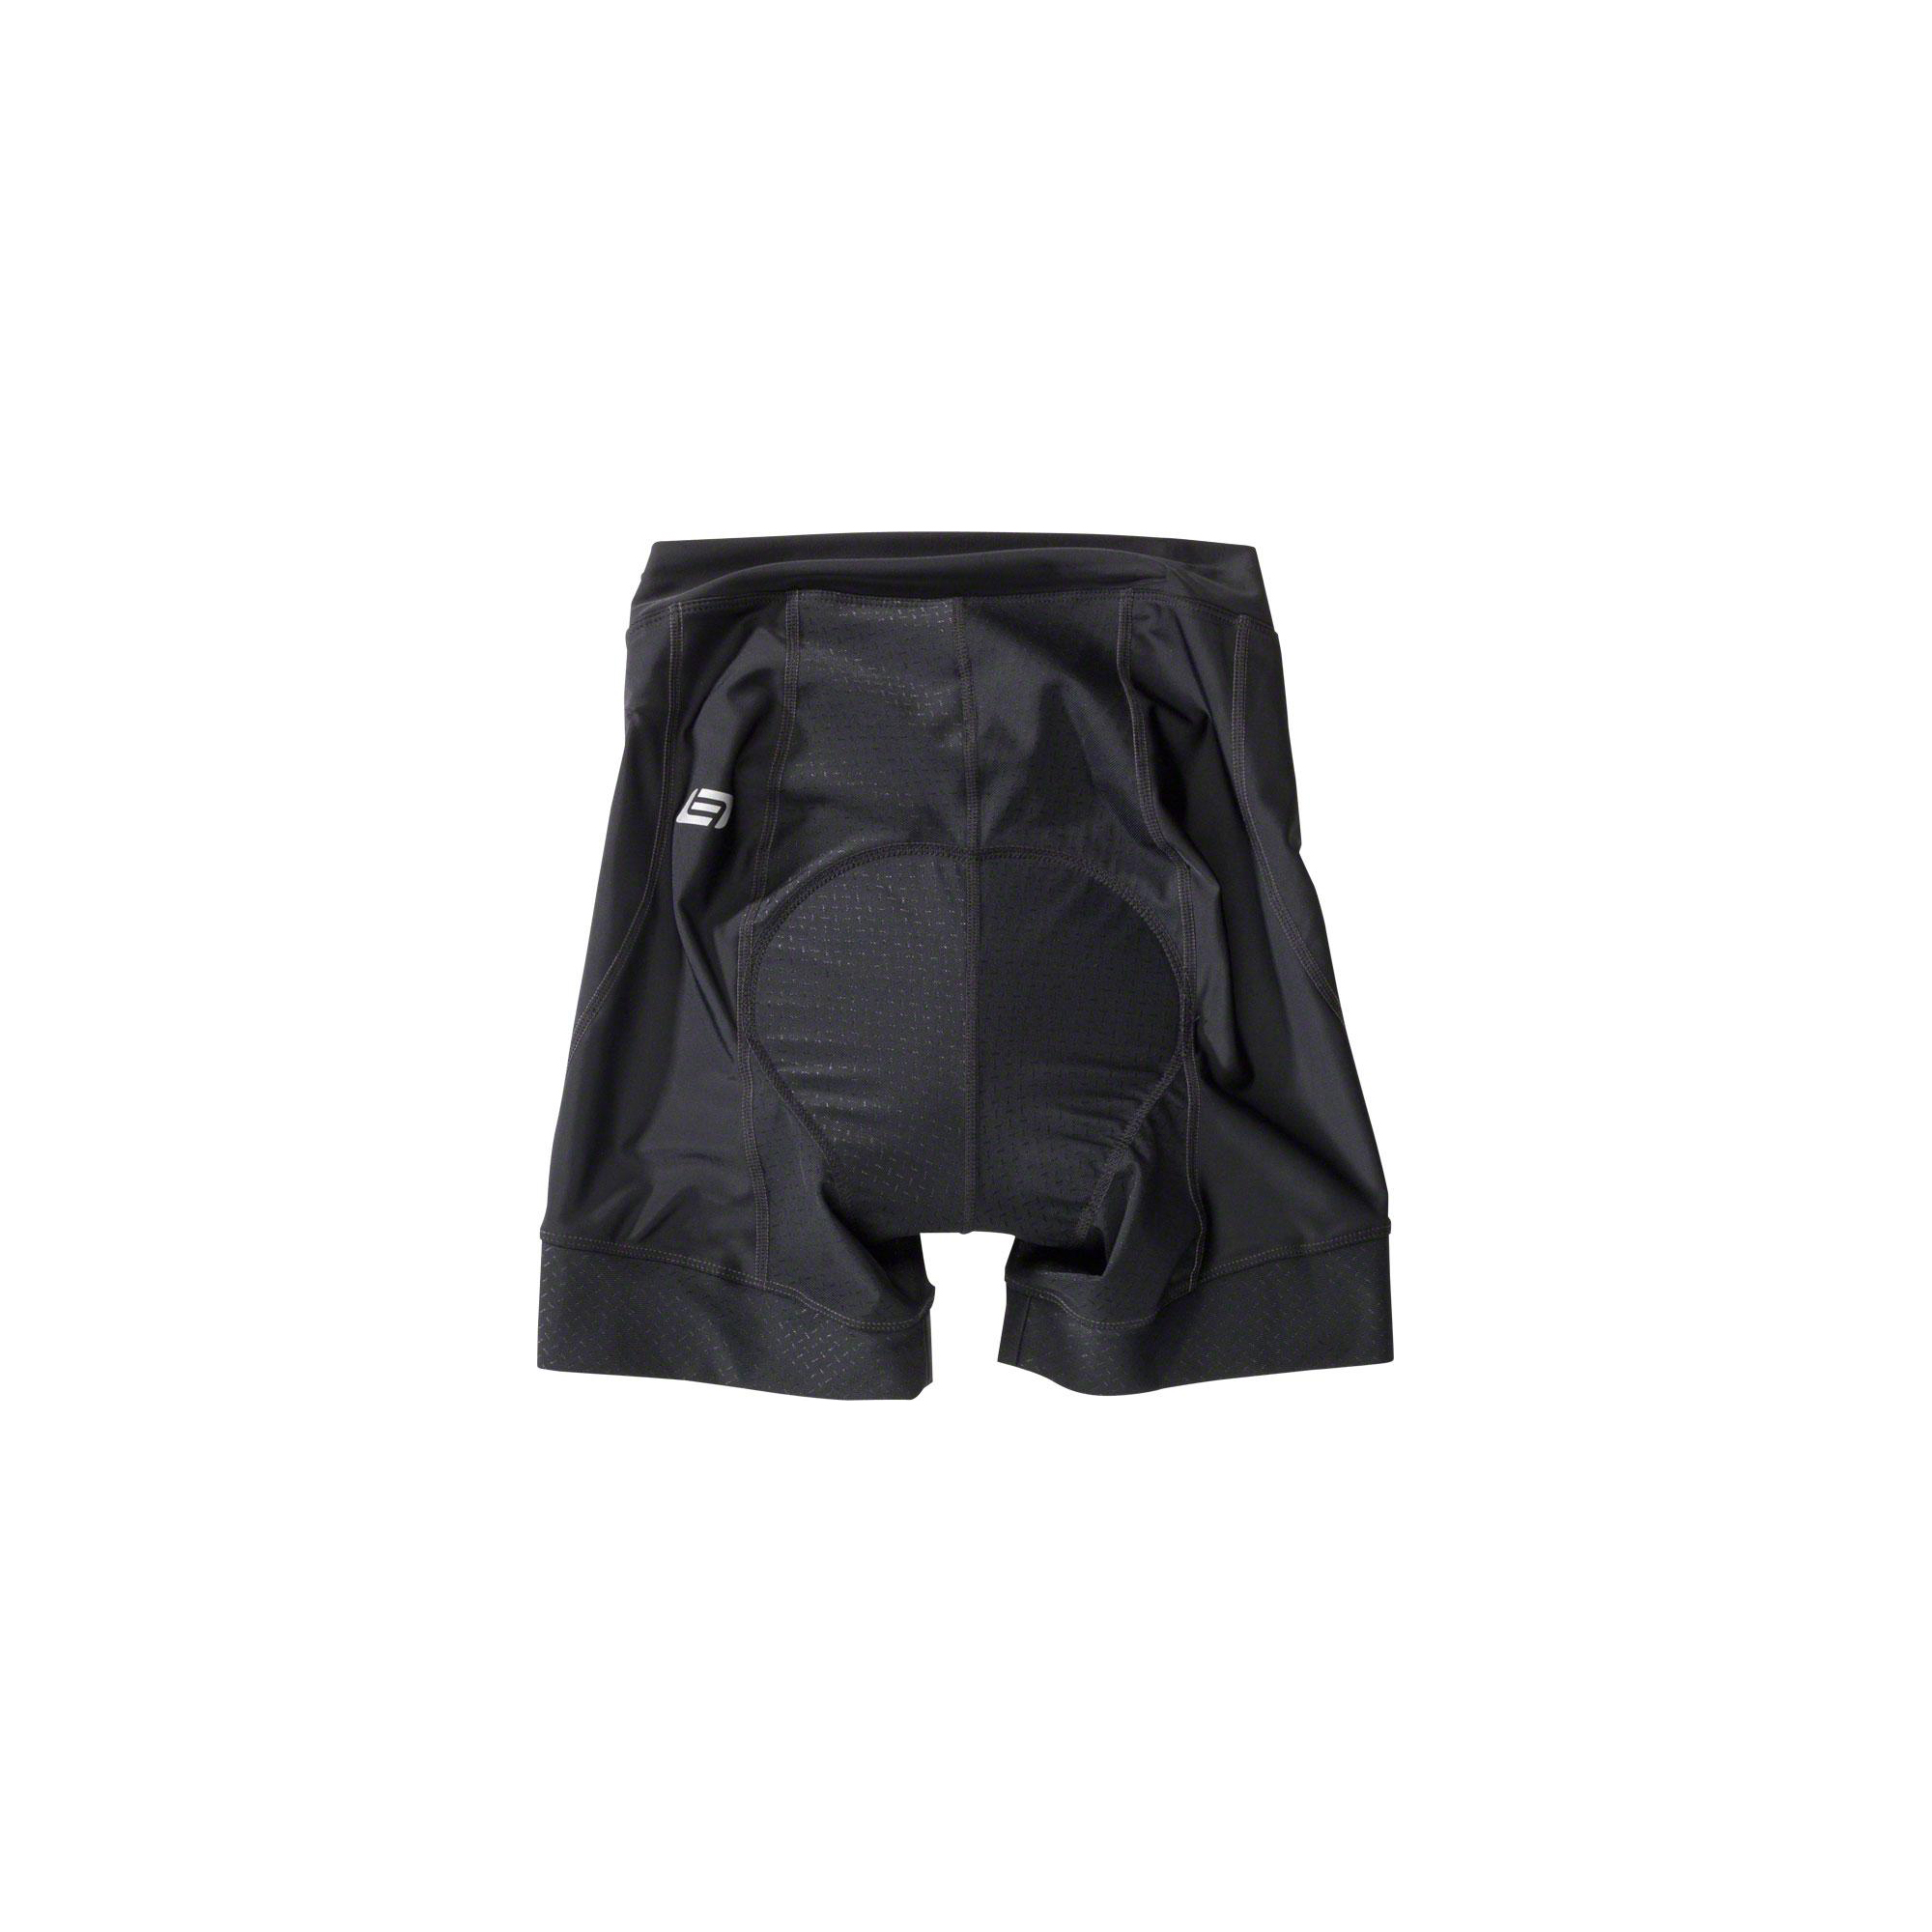 New Bellwether Axiom Men/'s Shorts Black LG